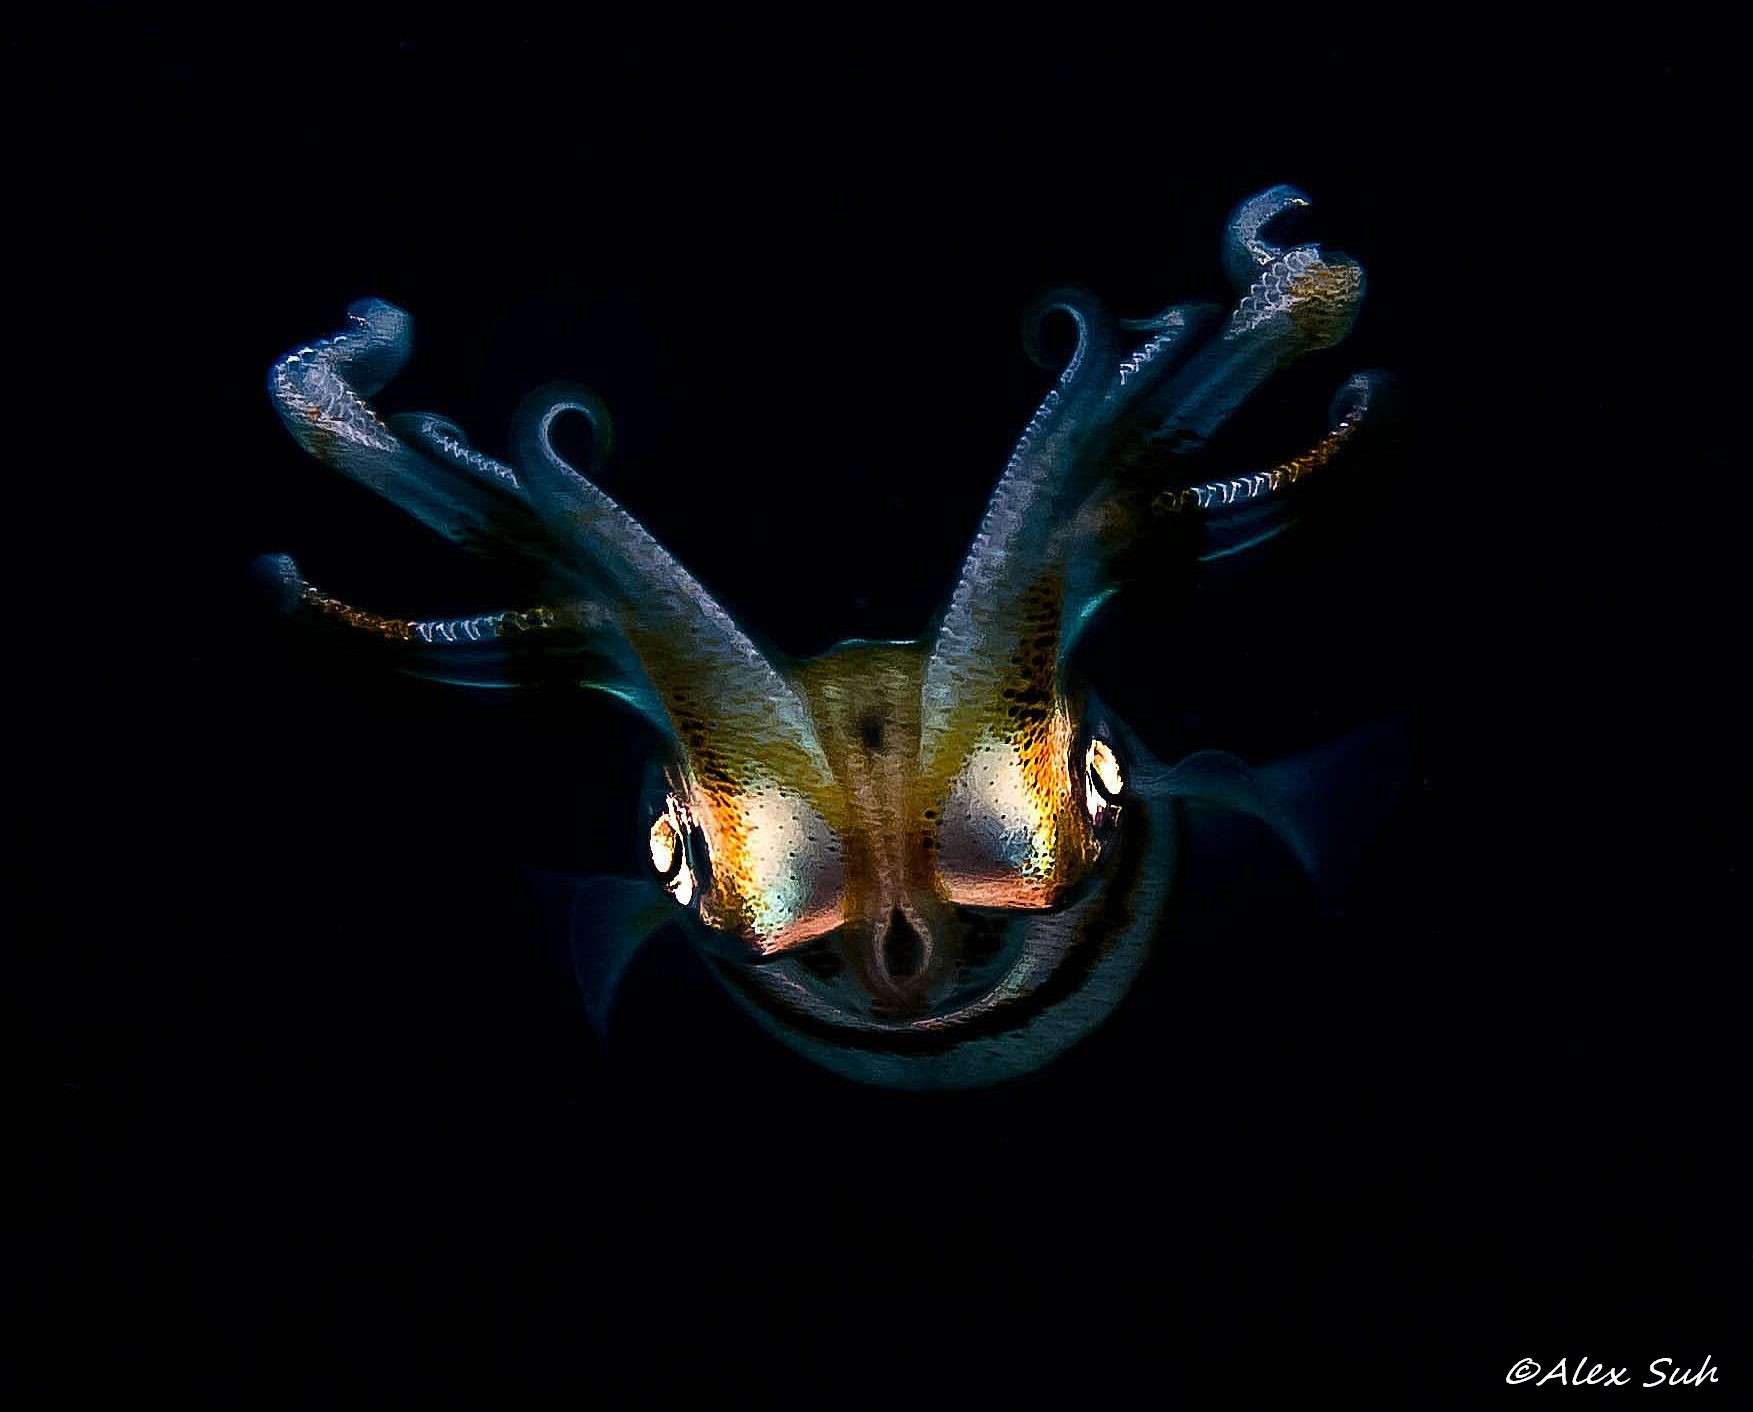 Squid (Loligo opalescens)